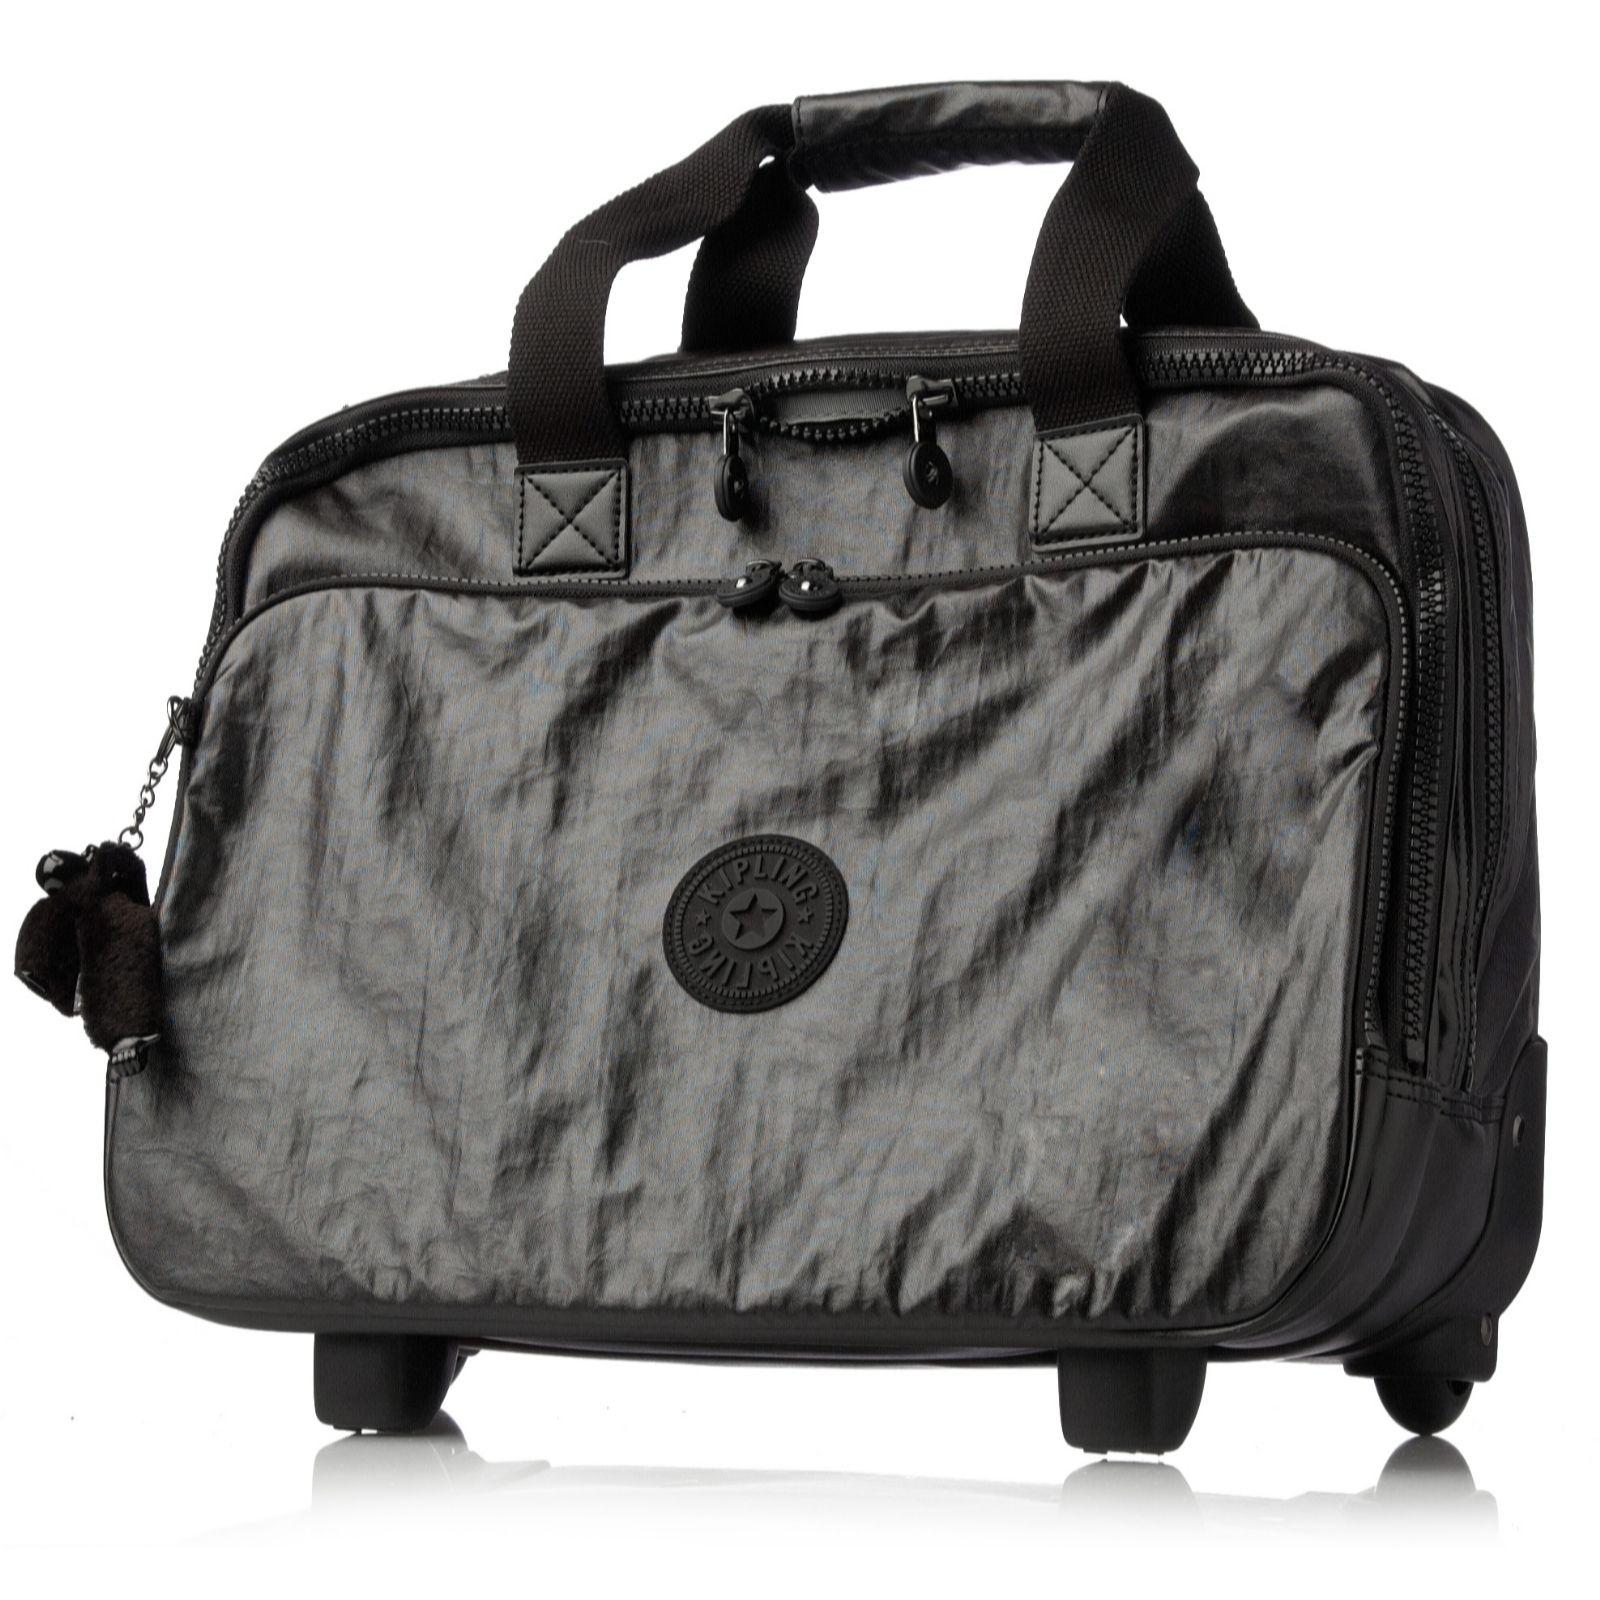 ce21510b90 Kipling Ceroc Wheeled Working Bag - QVC UK